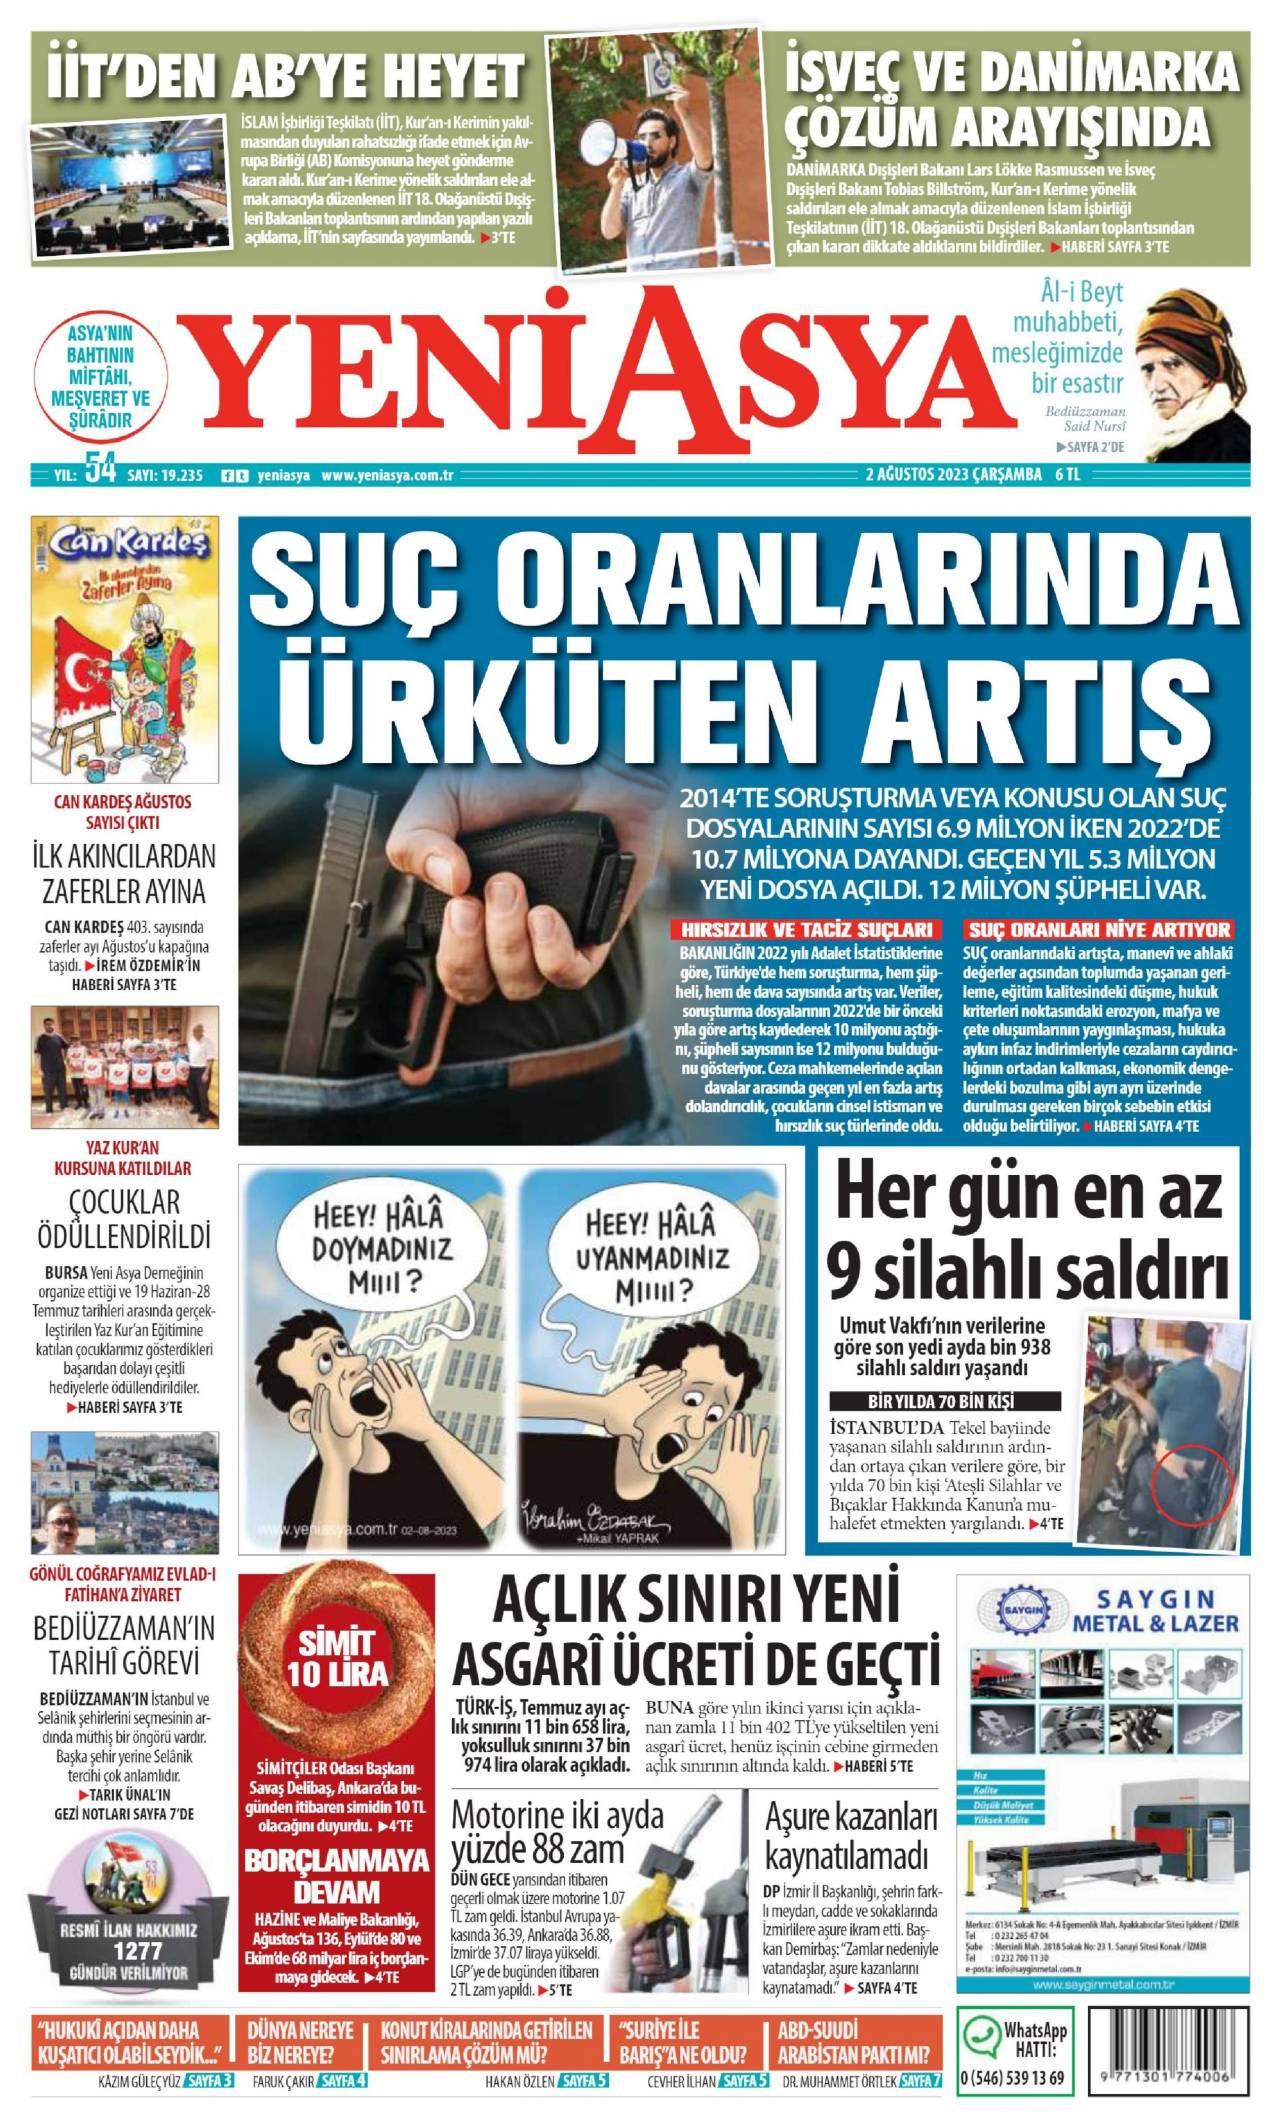 yeniasya Gazetesi